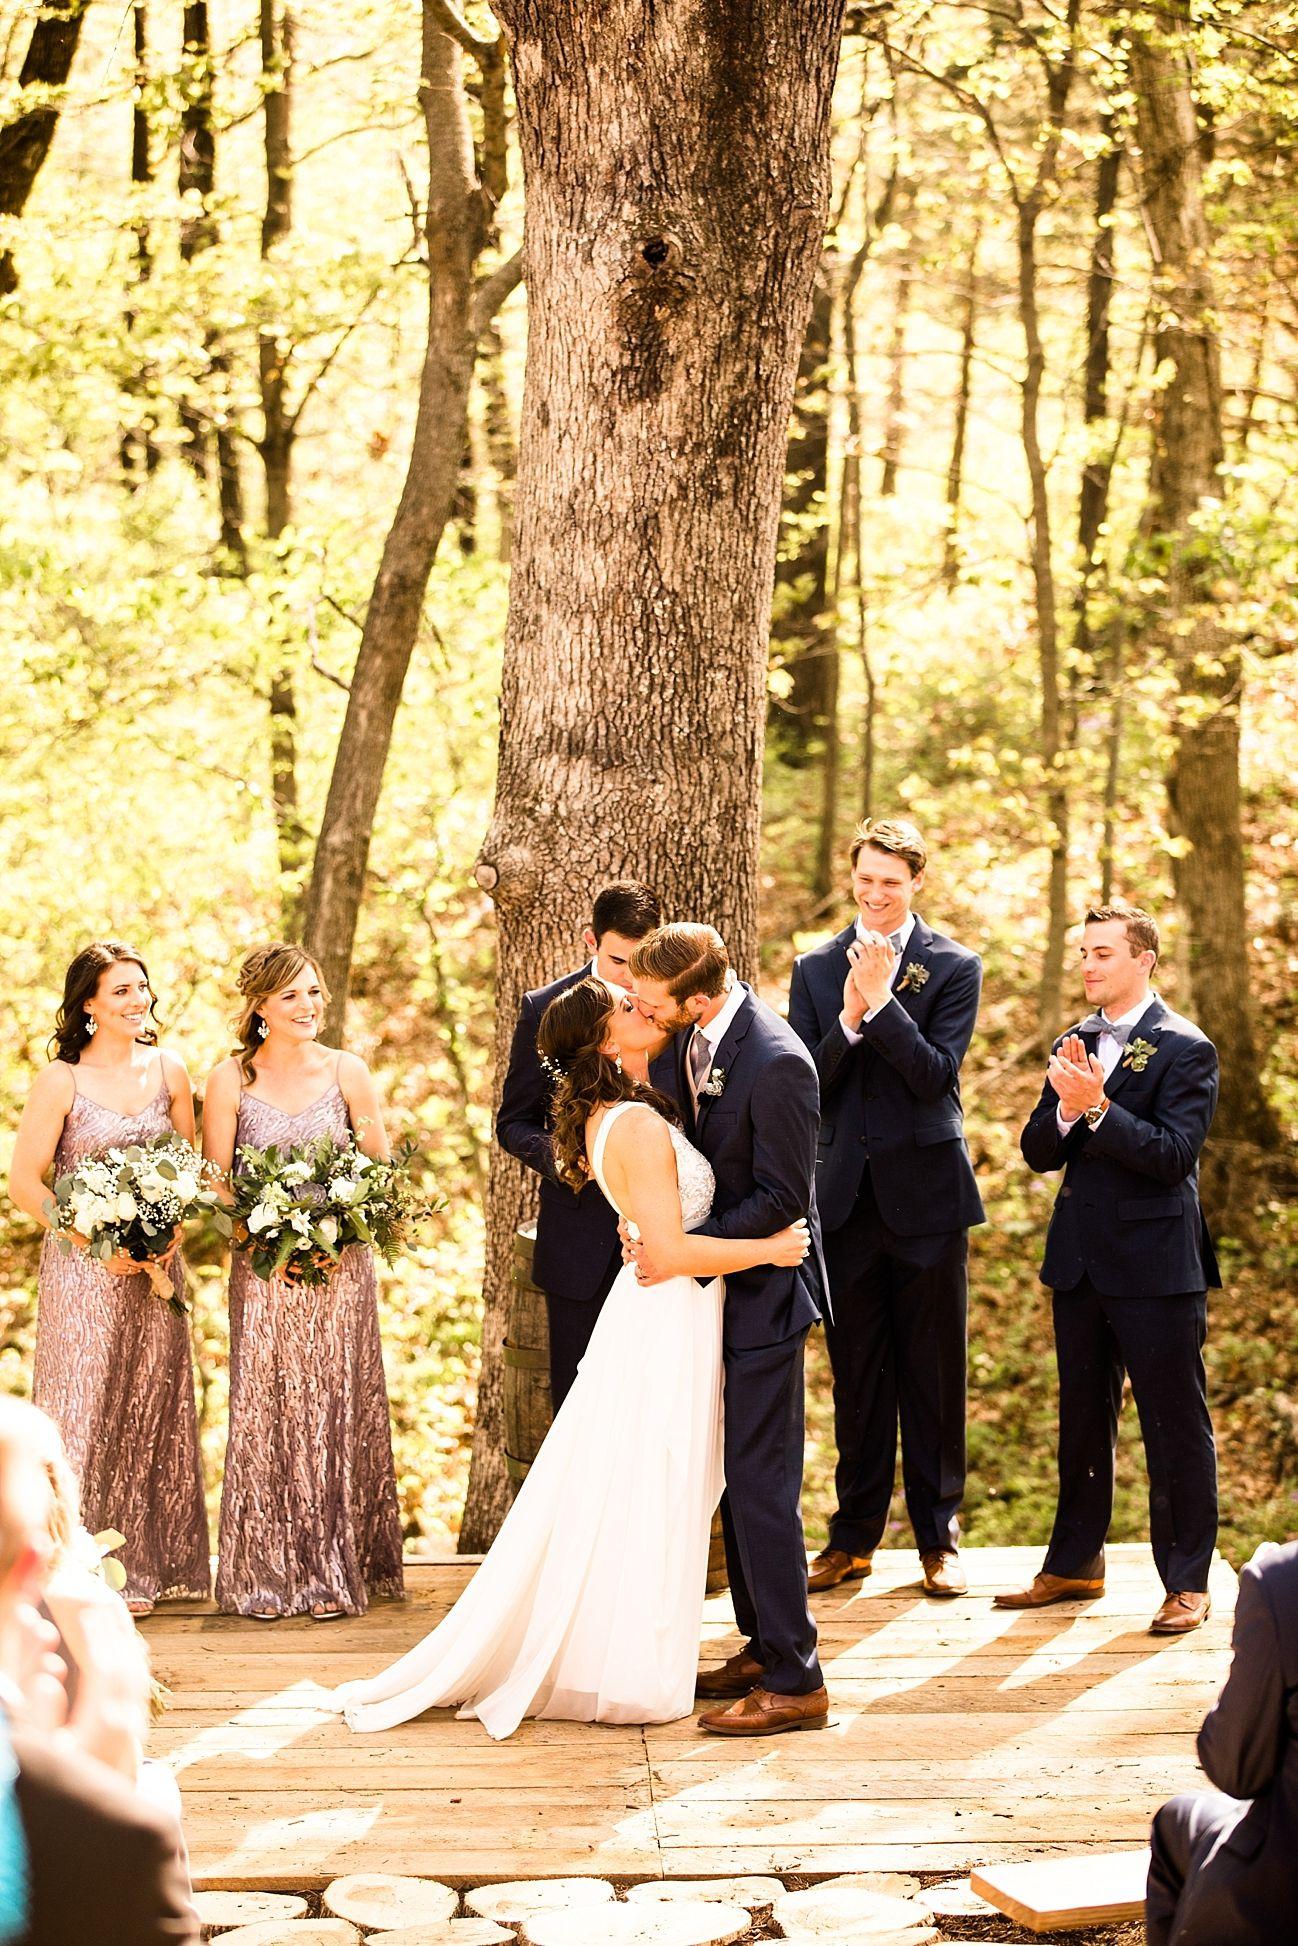 Patrick u tillie woodsy backyard wedding in columbia missouri